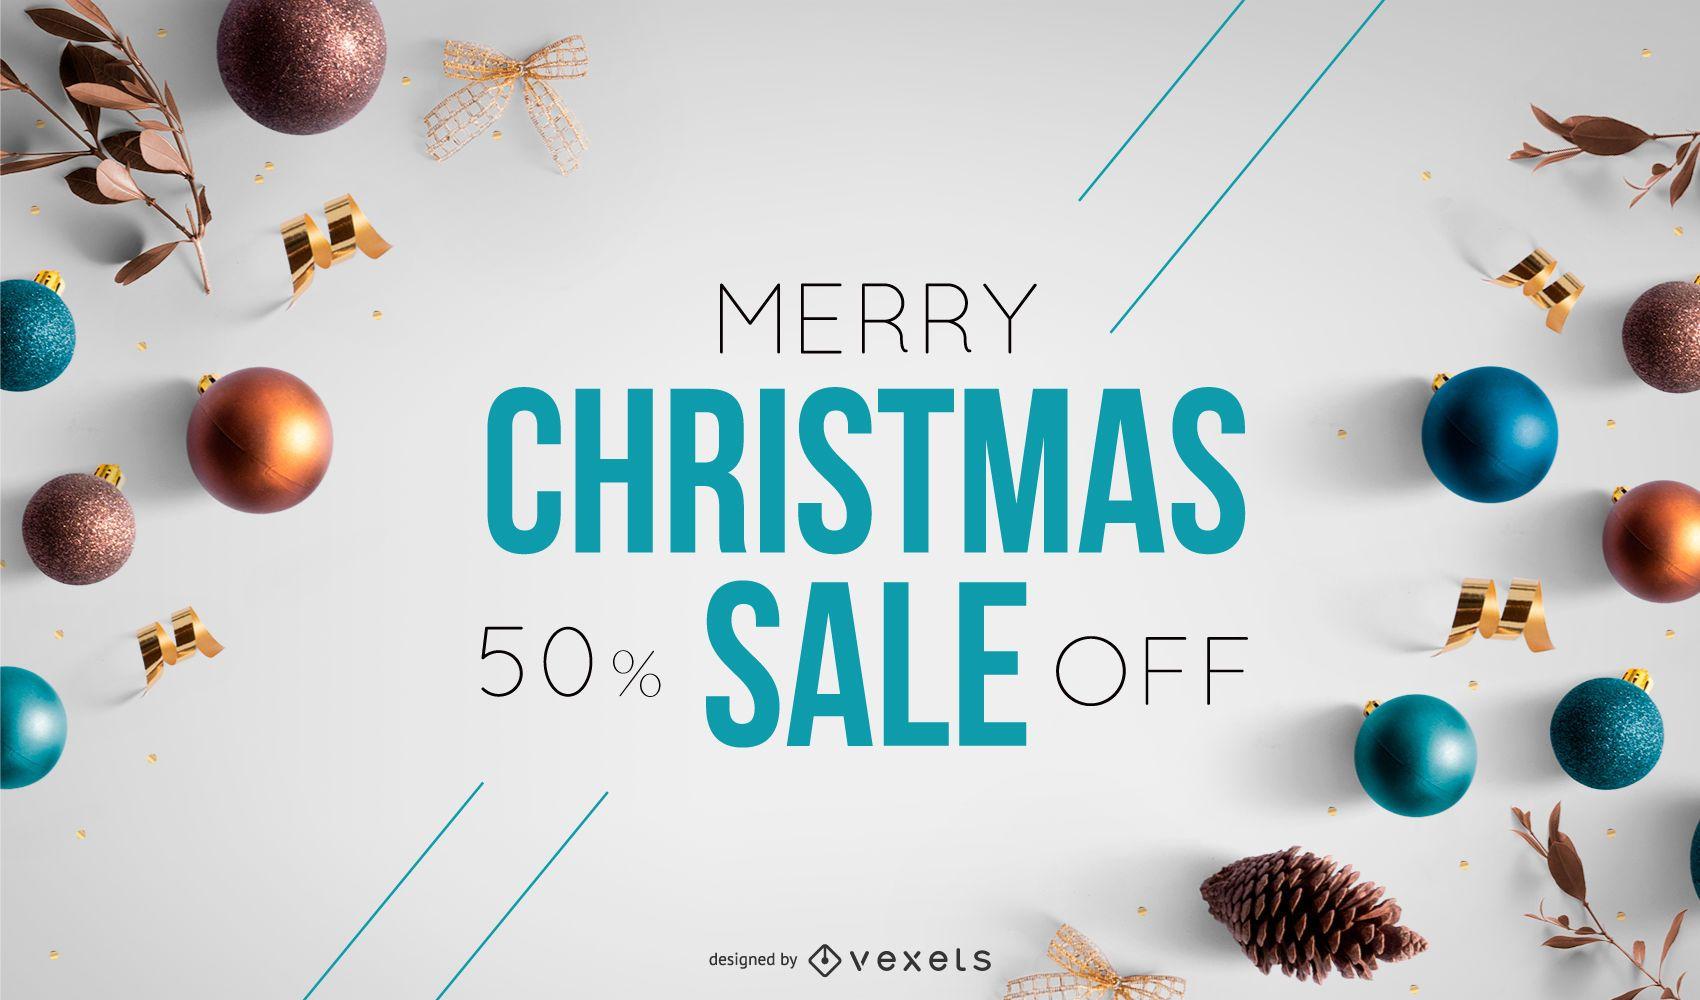 Christmas sale photo banner template